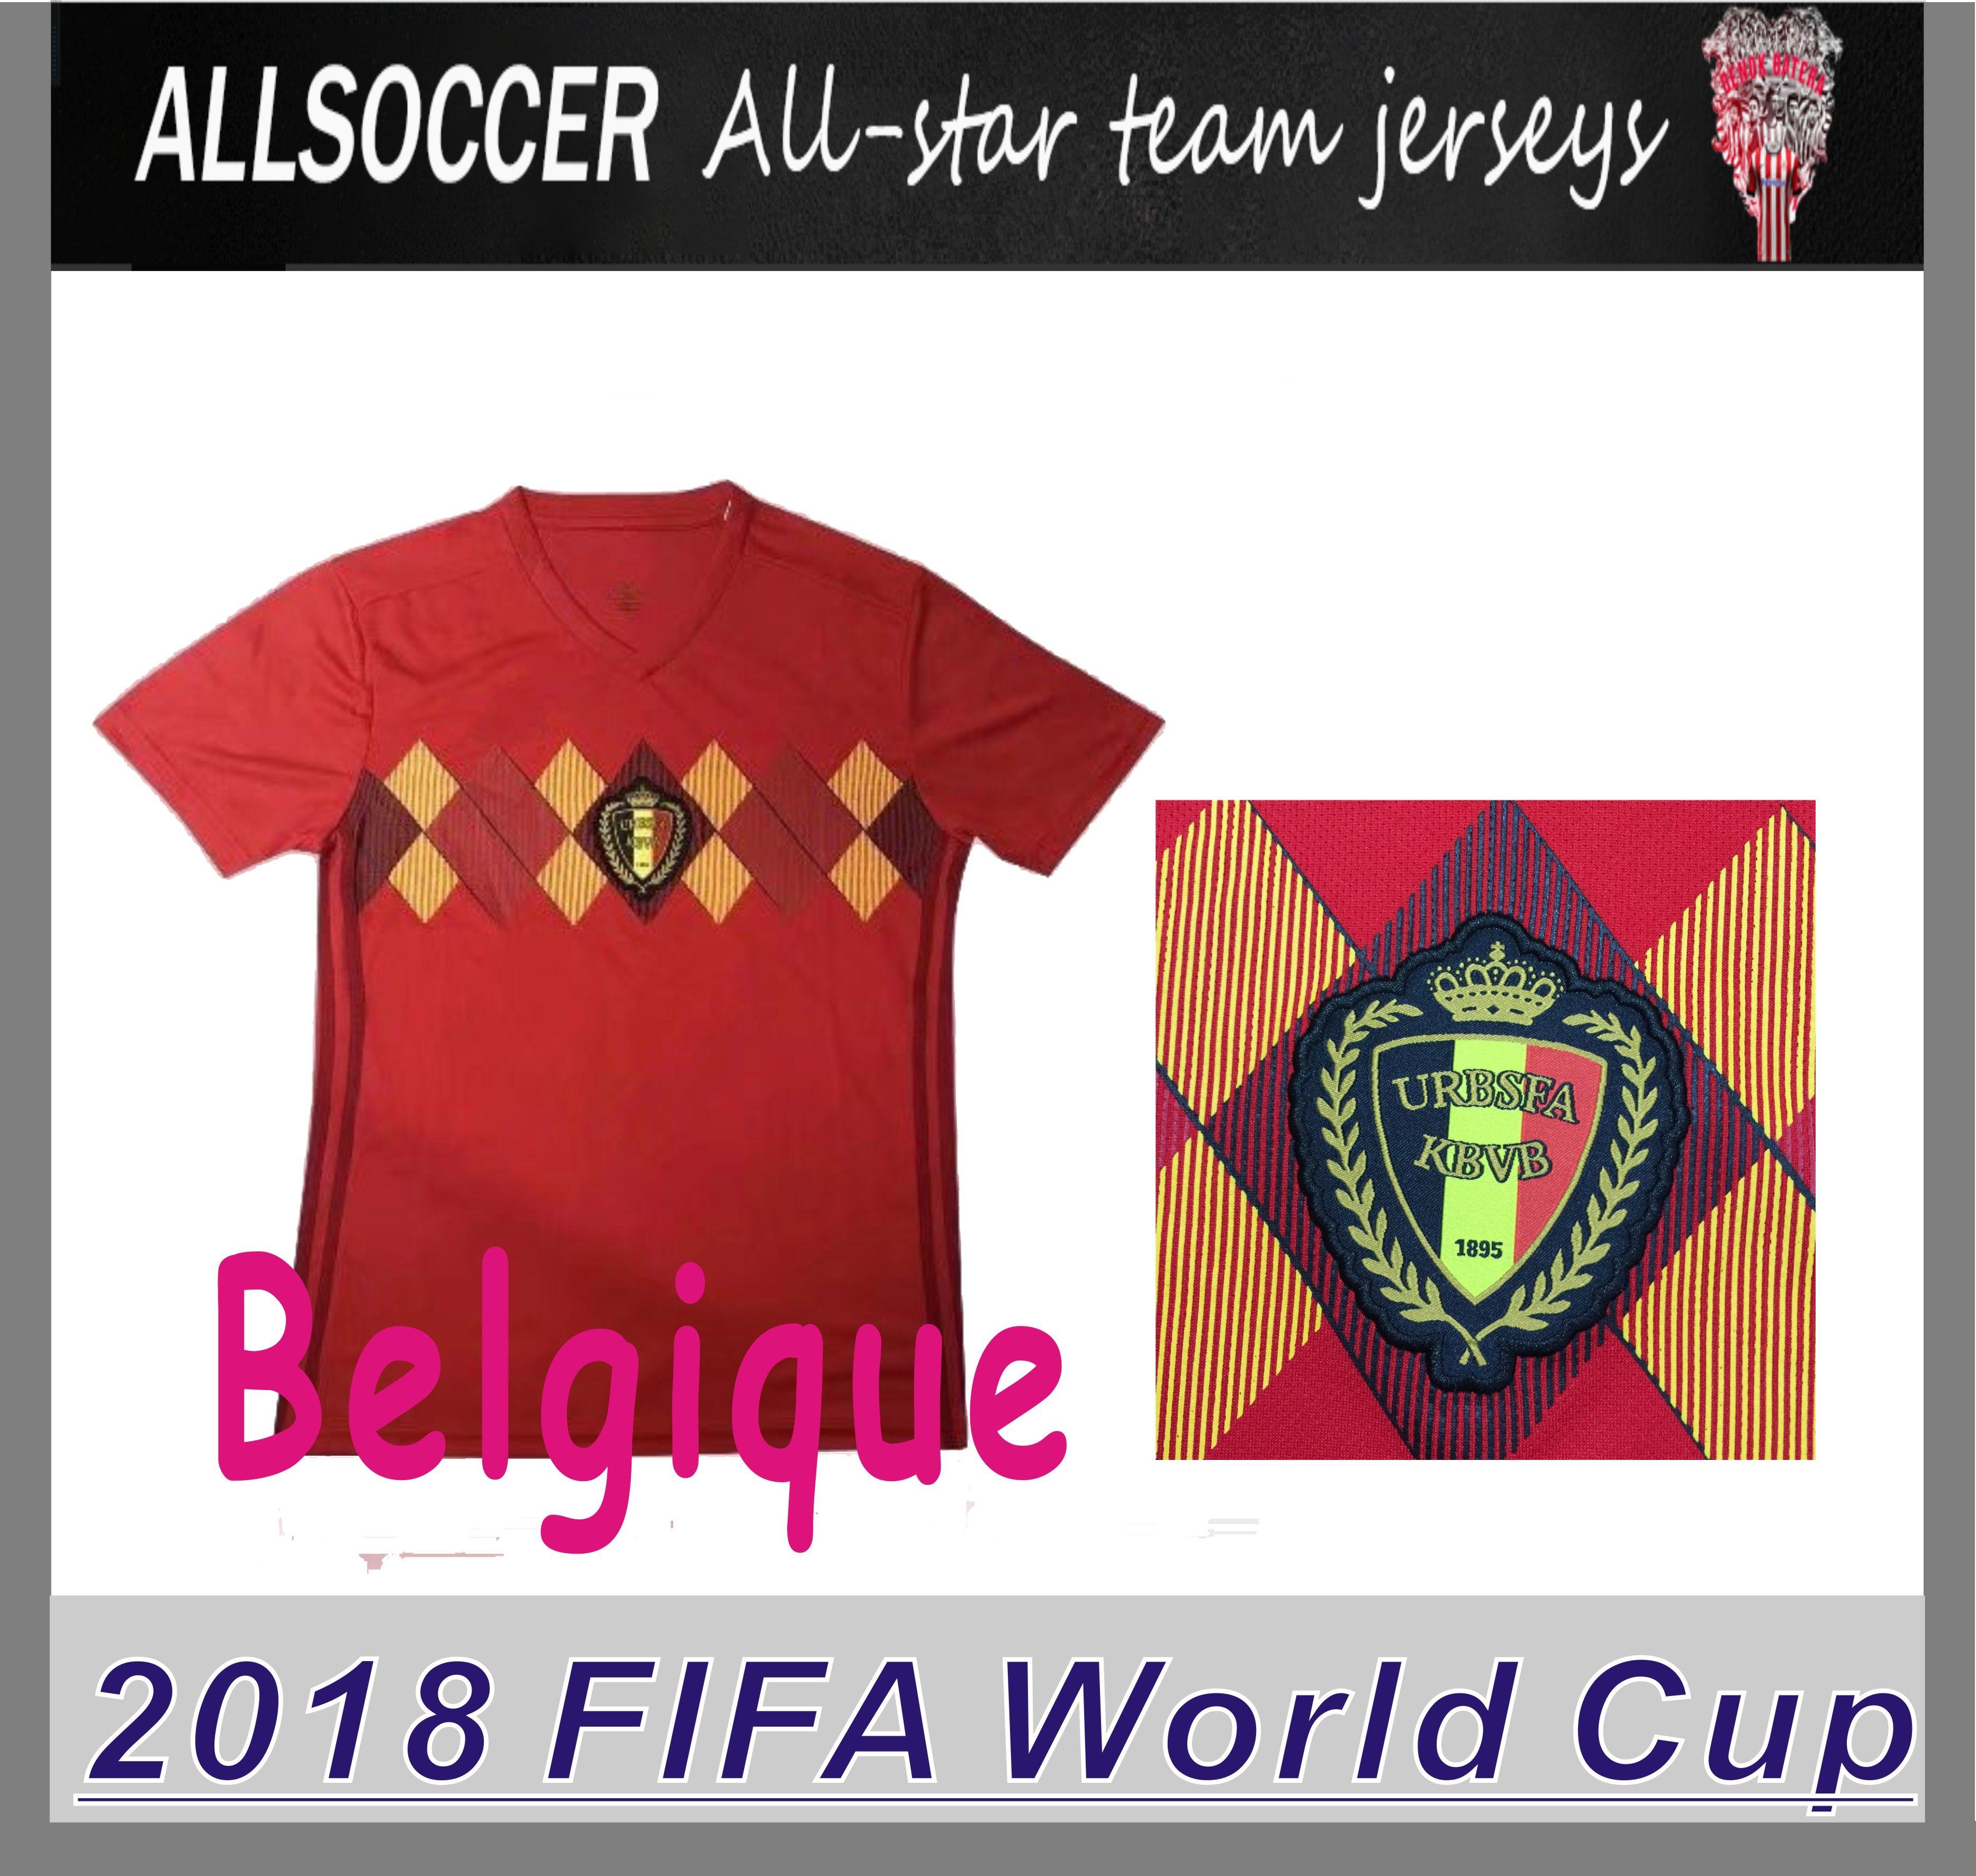 bbdb746cd 2018 World Cup Belgium Top Quality Belgique Home Red Soccer Shirt ...